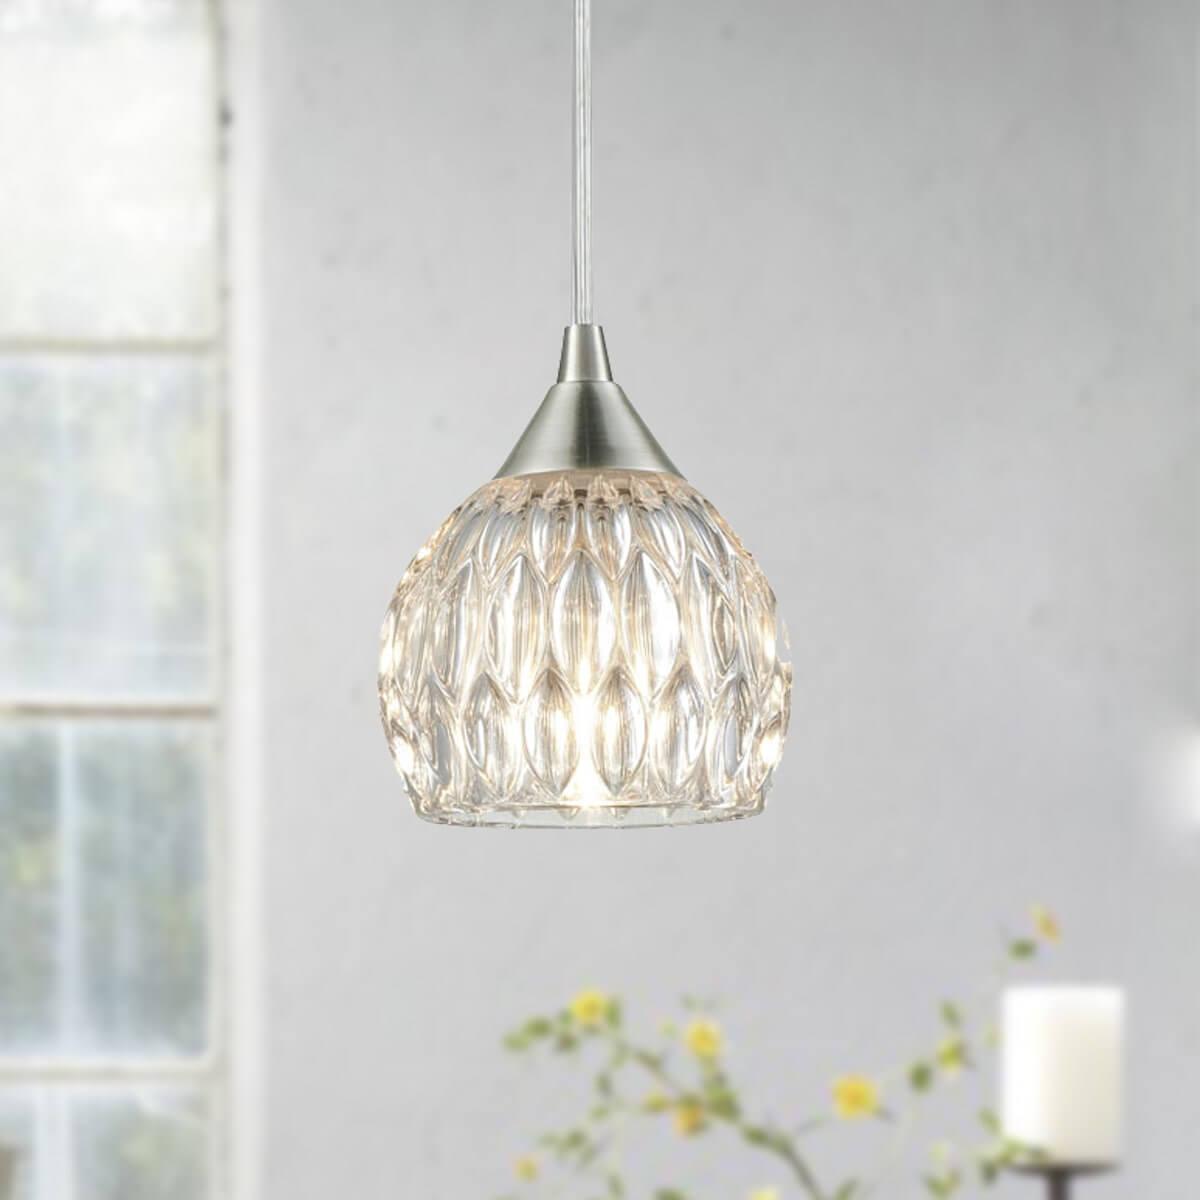 Modern Glass Mini Pendant Lights For Kitchen Island Brushed Nickel Finished